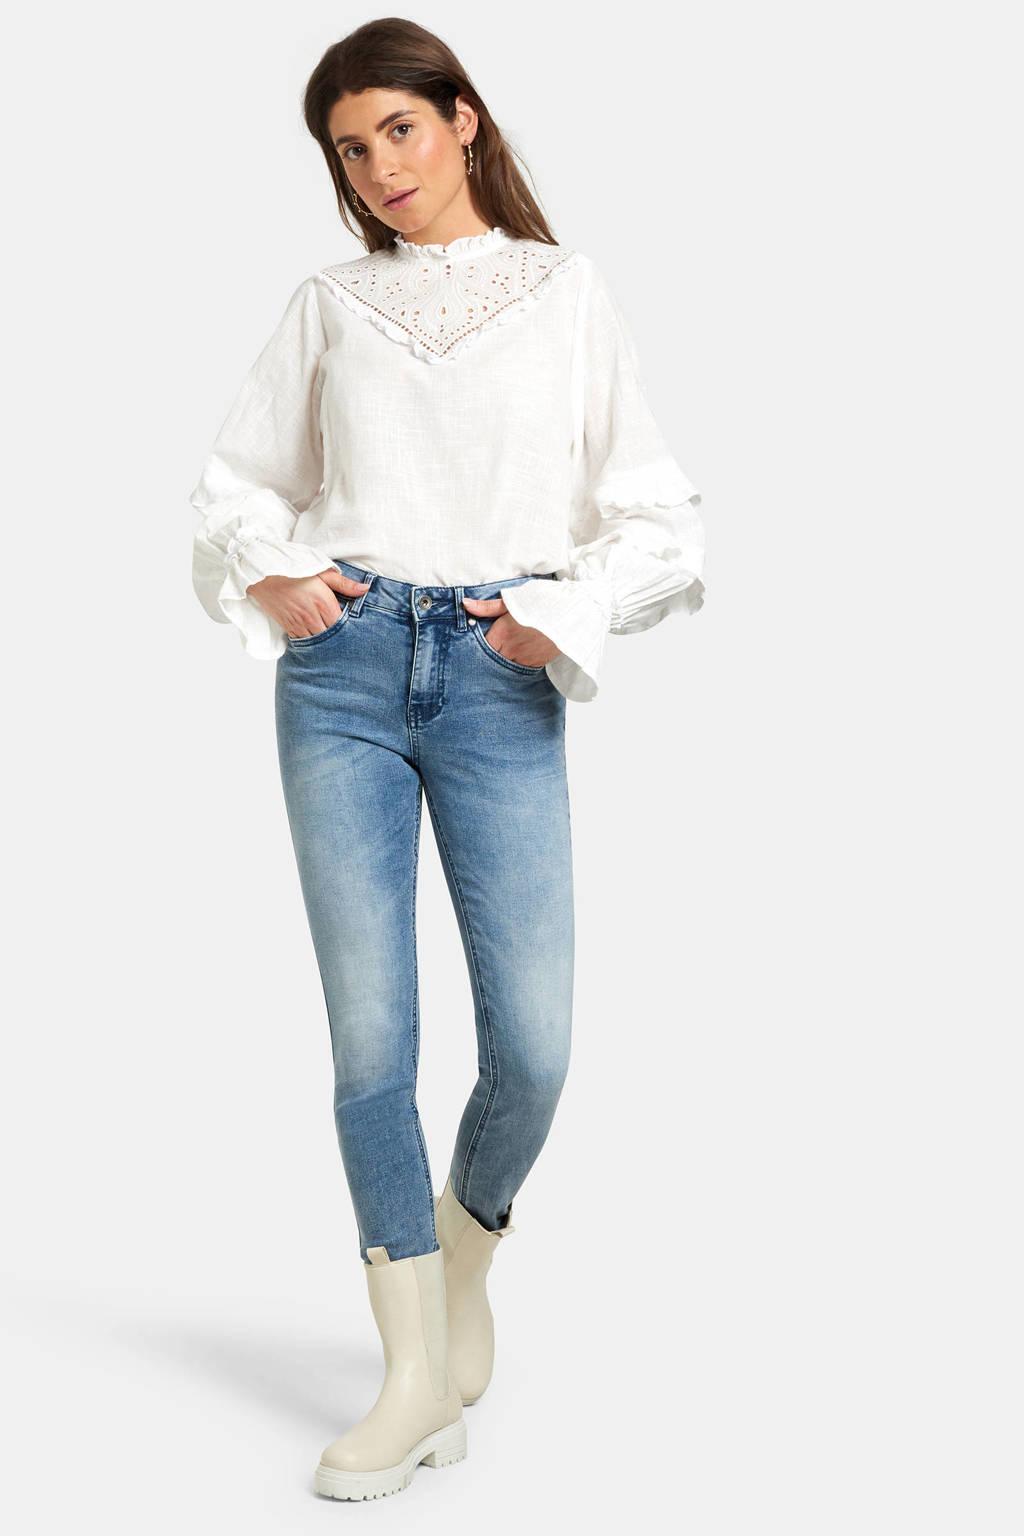 Eksept by Shoeby Liza Edith Skinny Jeans L32 light denim, Light denim